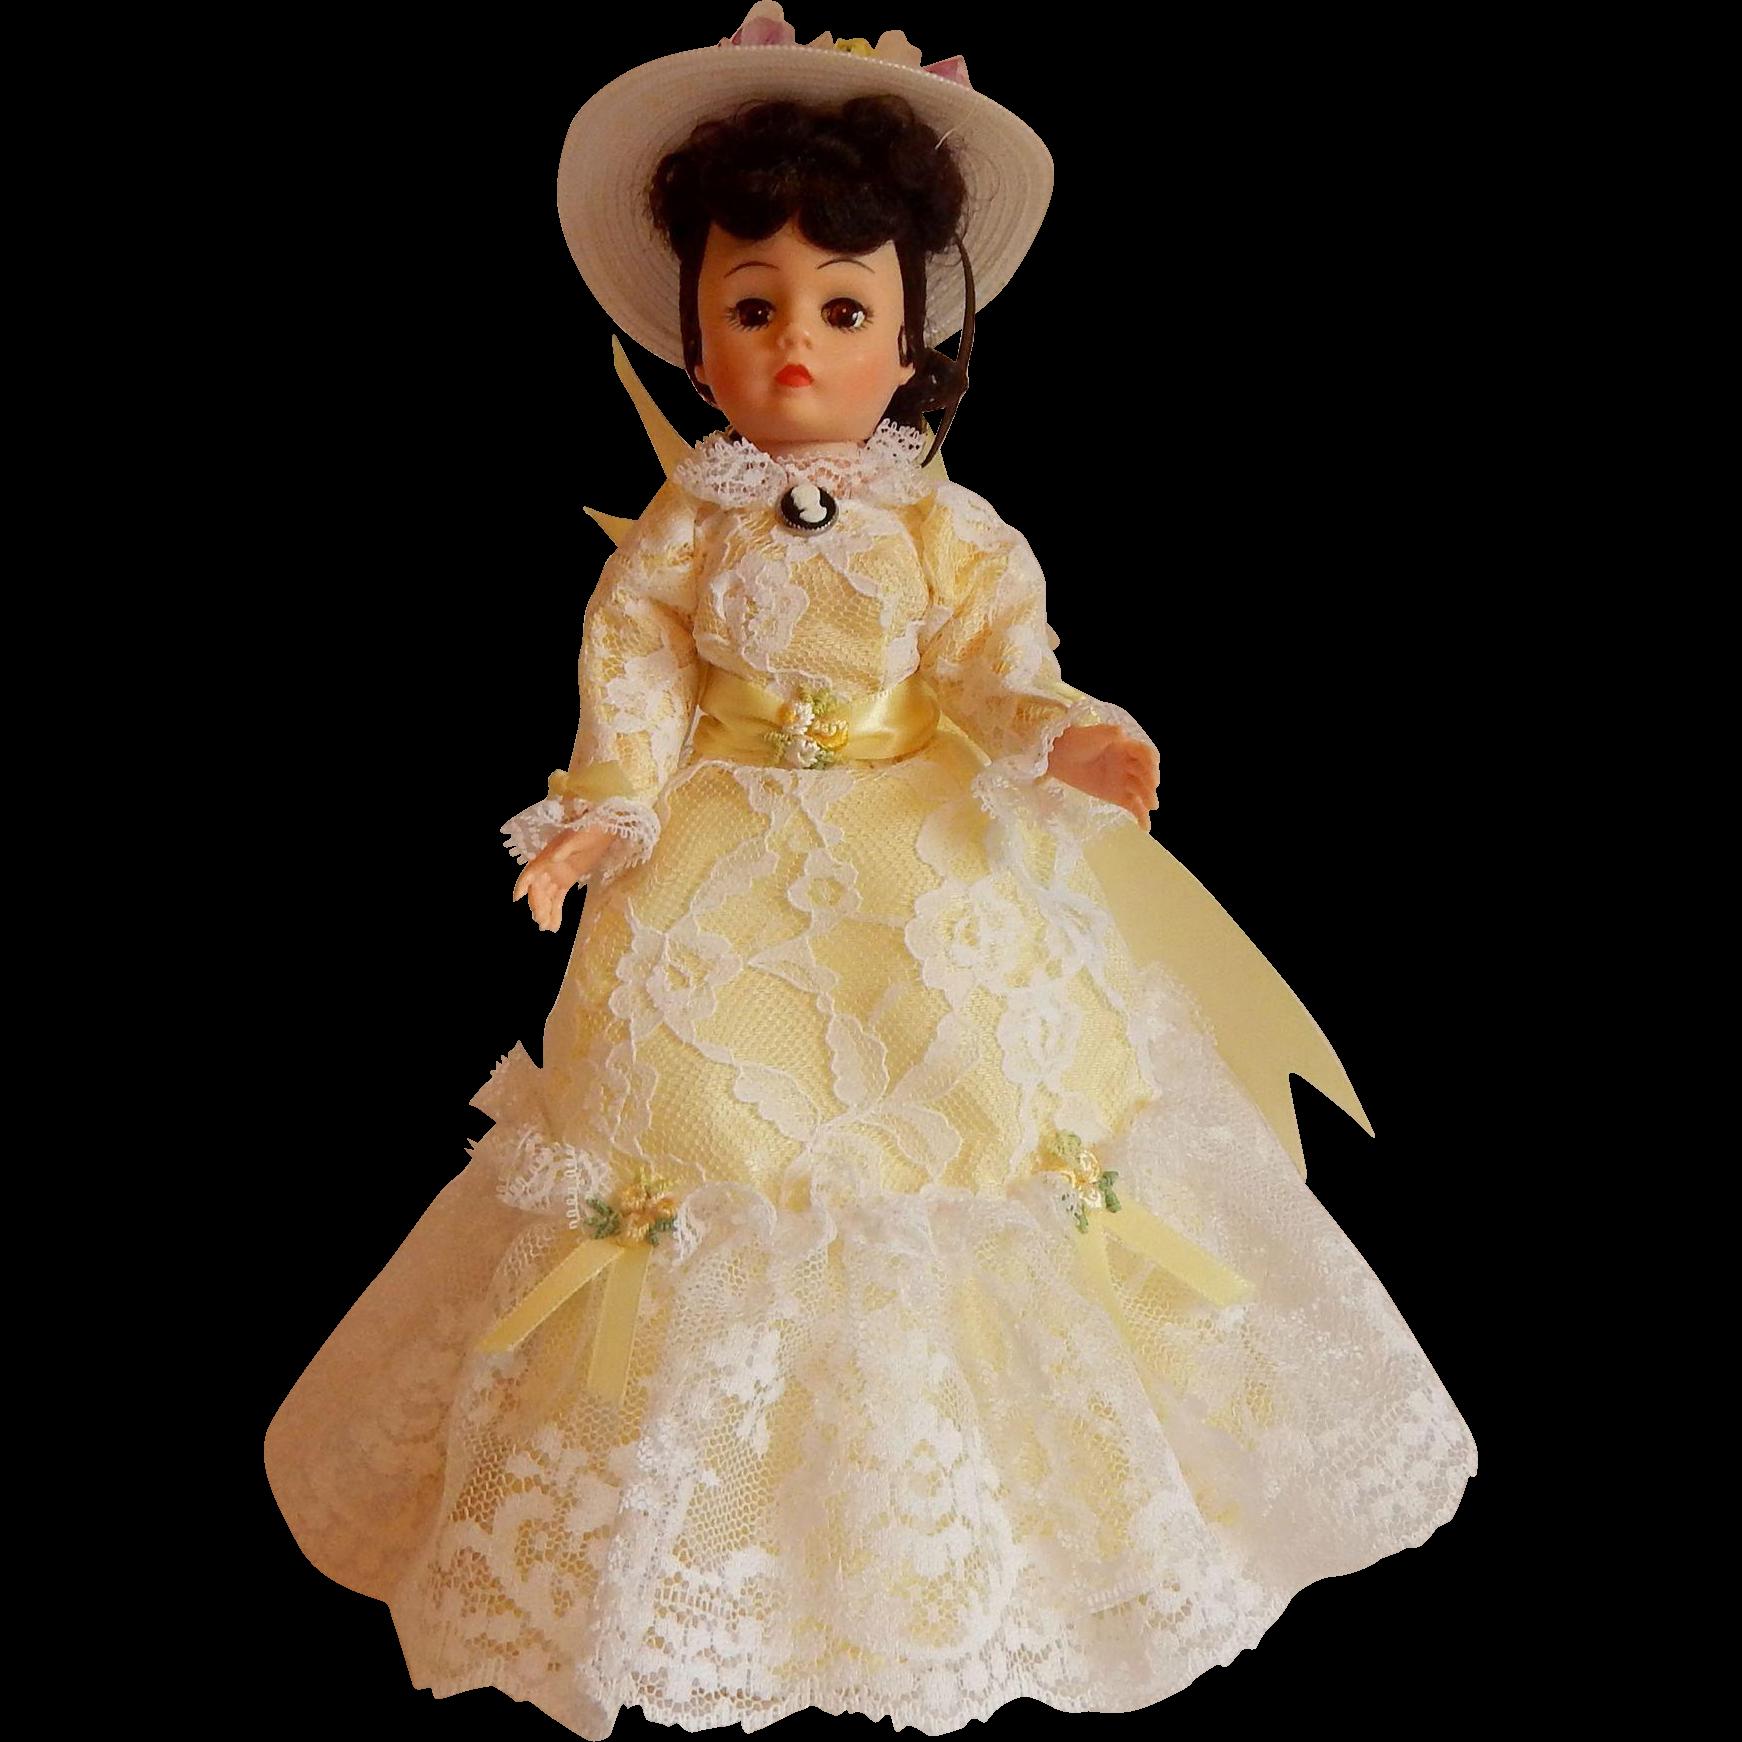 Madame Alexander Daisy Portrette Series